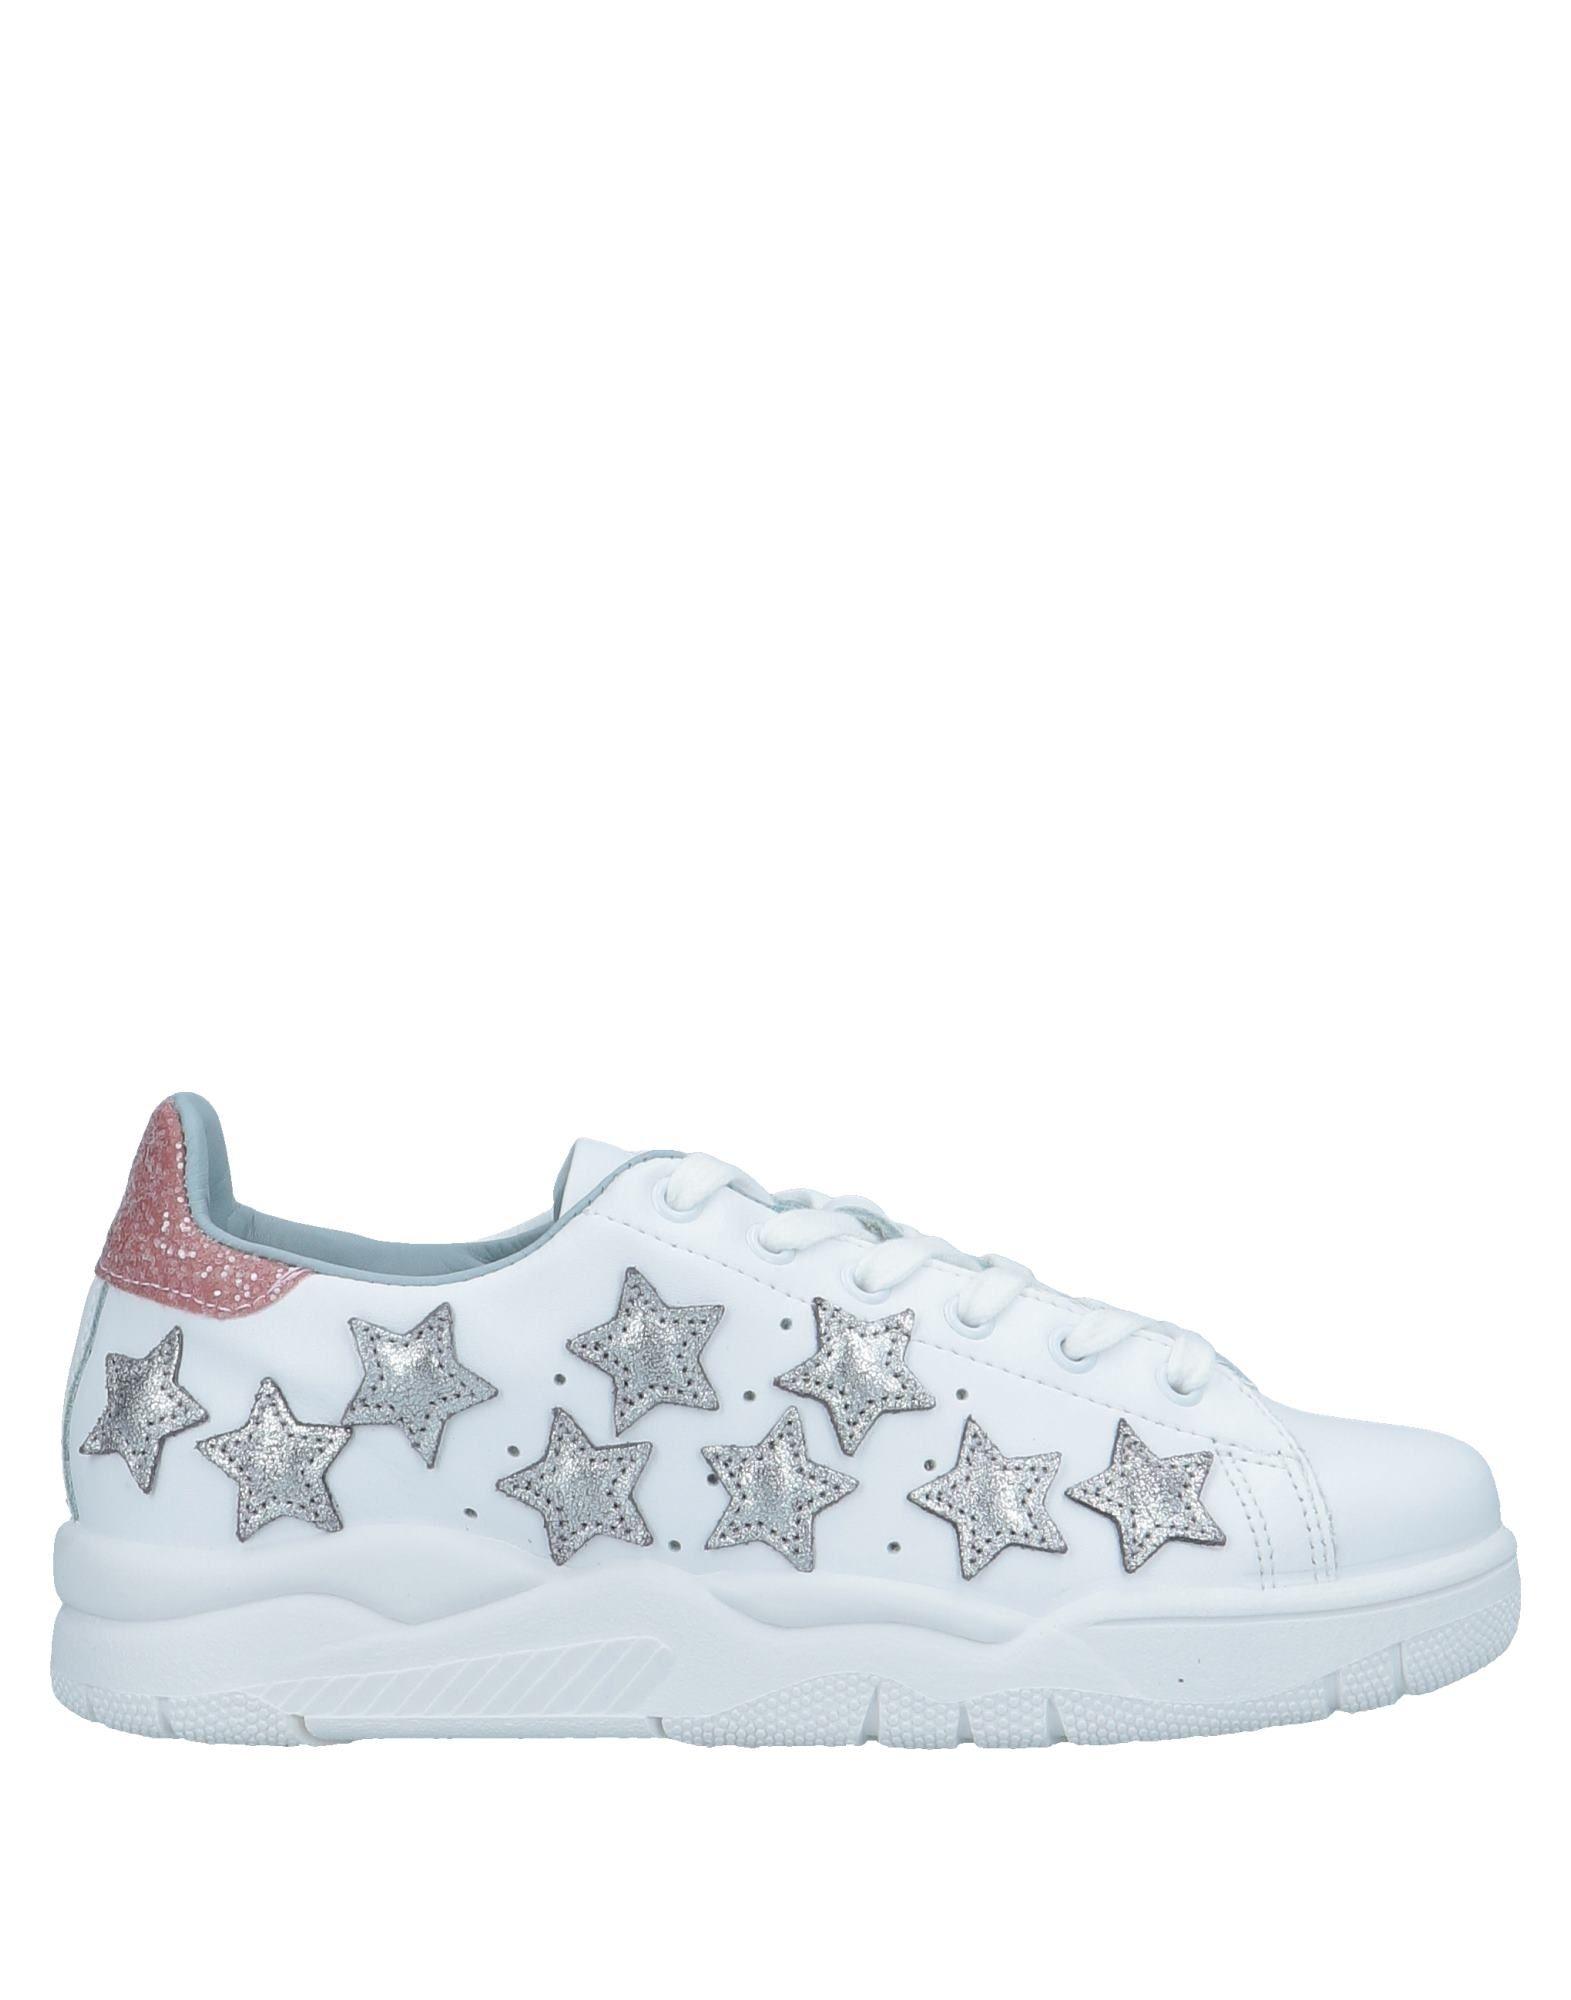 Chiara Ferragni Ferragni Sneakers - Women Chiara Ferragni Ferragni Sneakers online on  United Kingdom - 11561101MT 6bea84